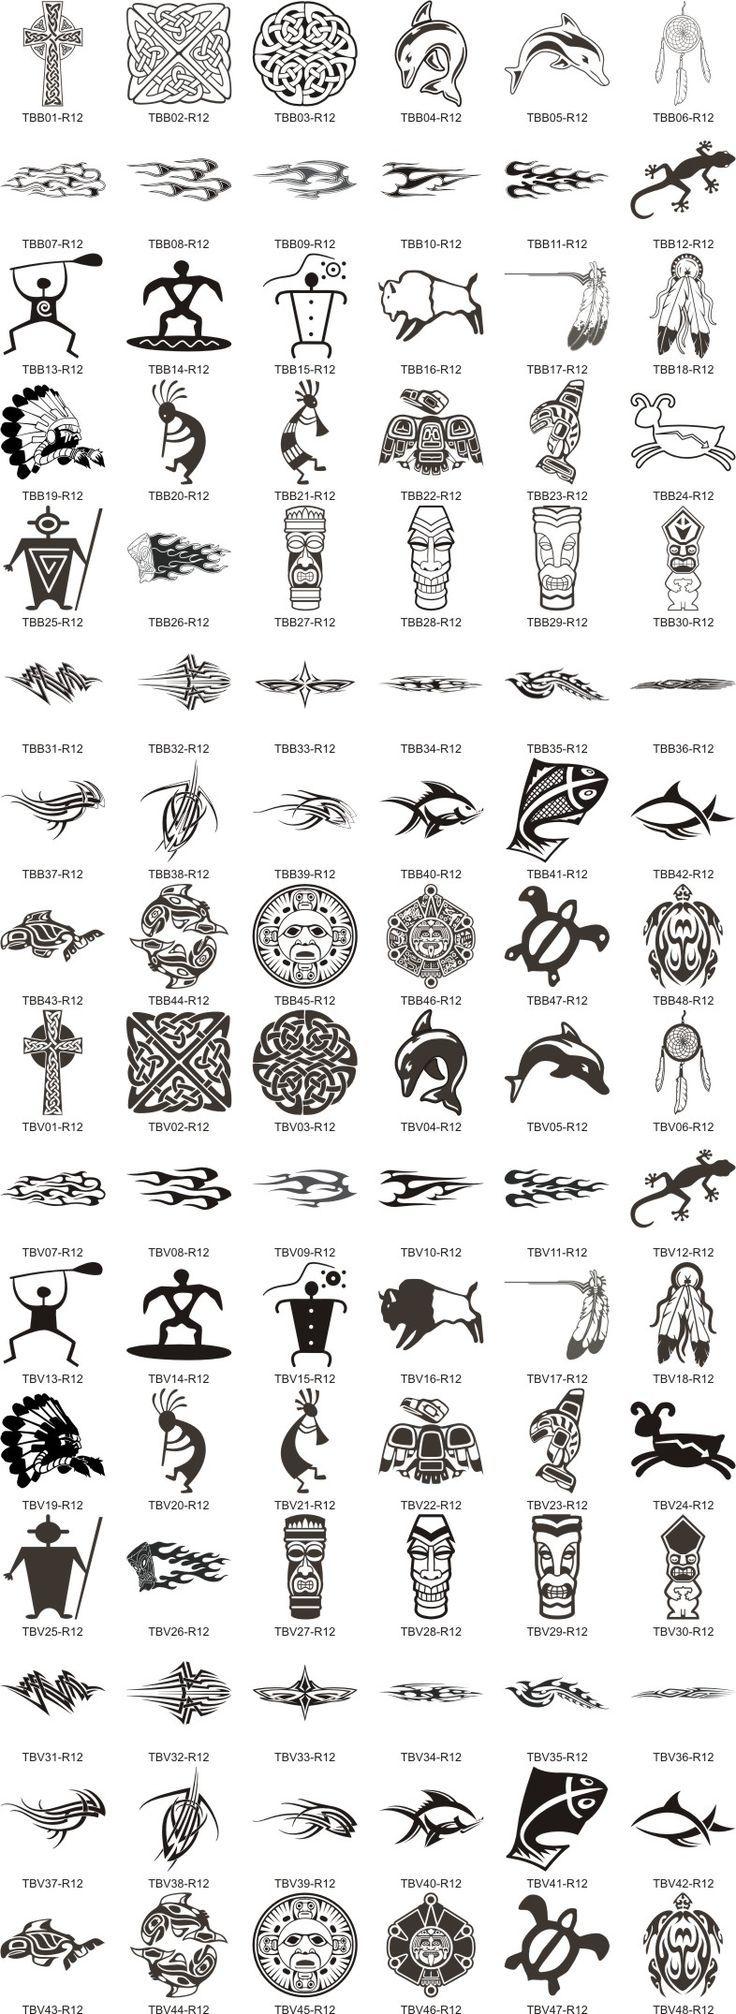 Drawn symbol symbol name Mandala symbols on Pinterest symbols